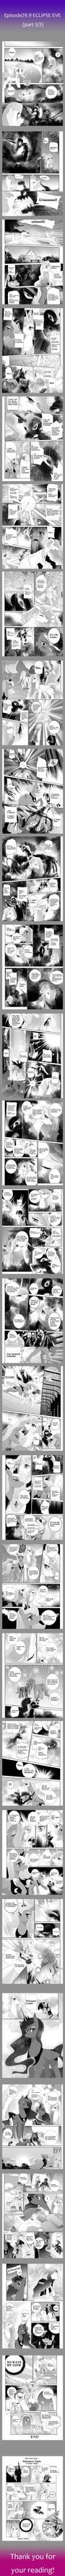 [Comic] Episode29.9 ECLIPSE EVE part3/3 by yuki-zakuro